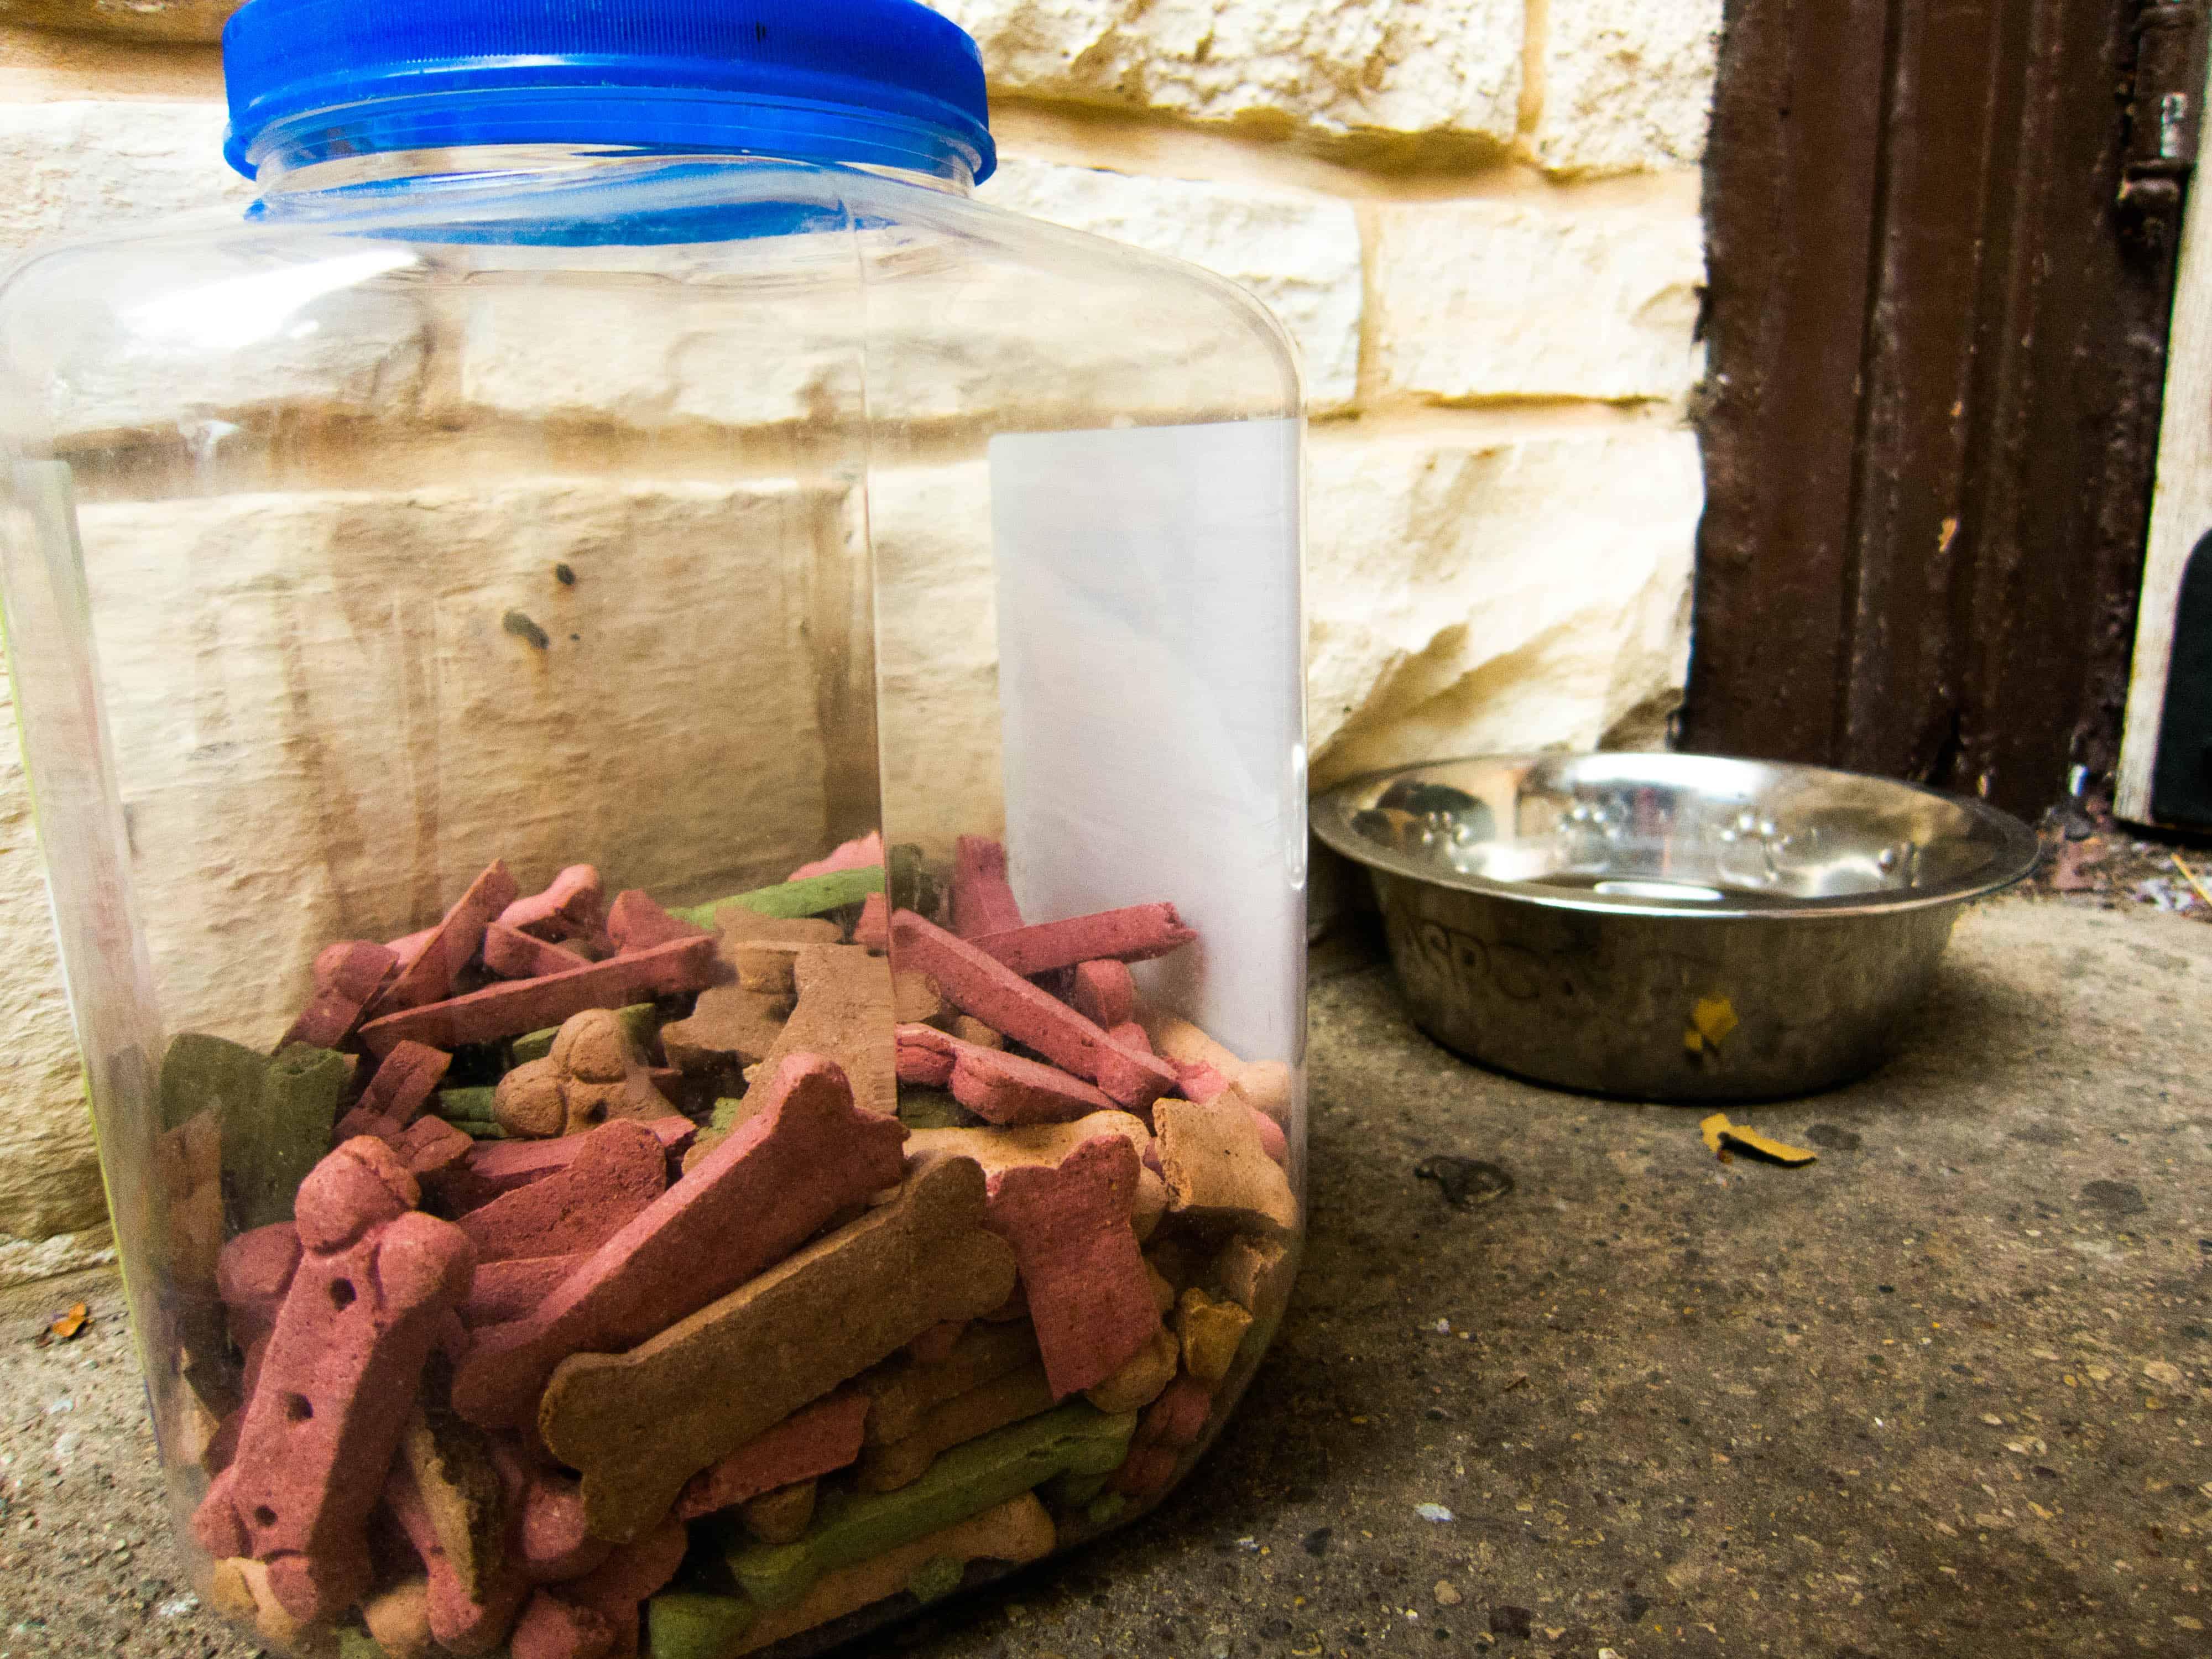 Rhodesian Ridgeback, pet friendly, petcentric, dog adventure, marking our territory